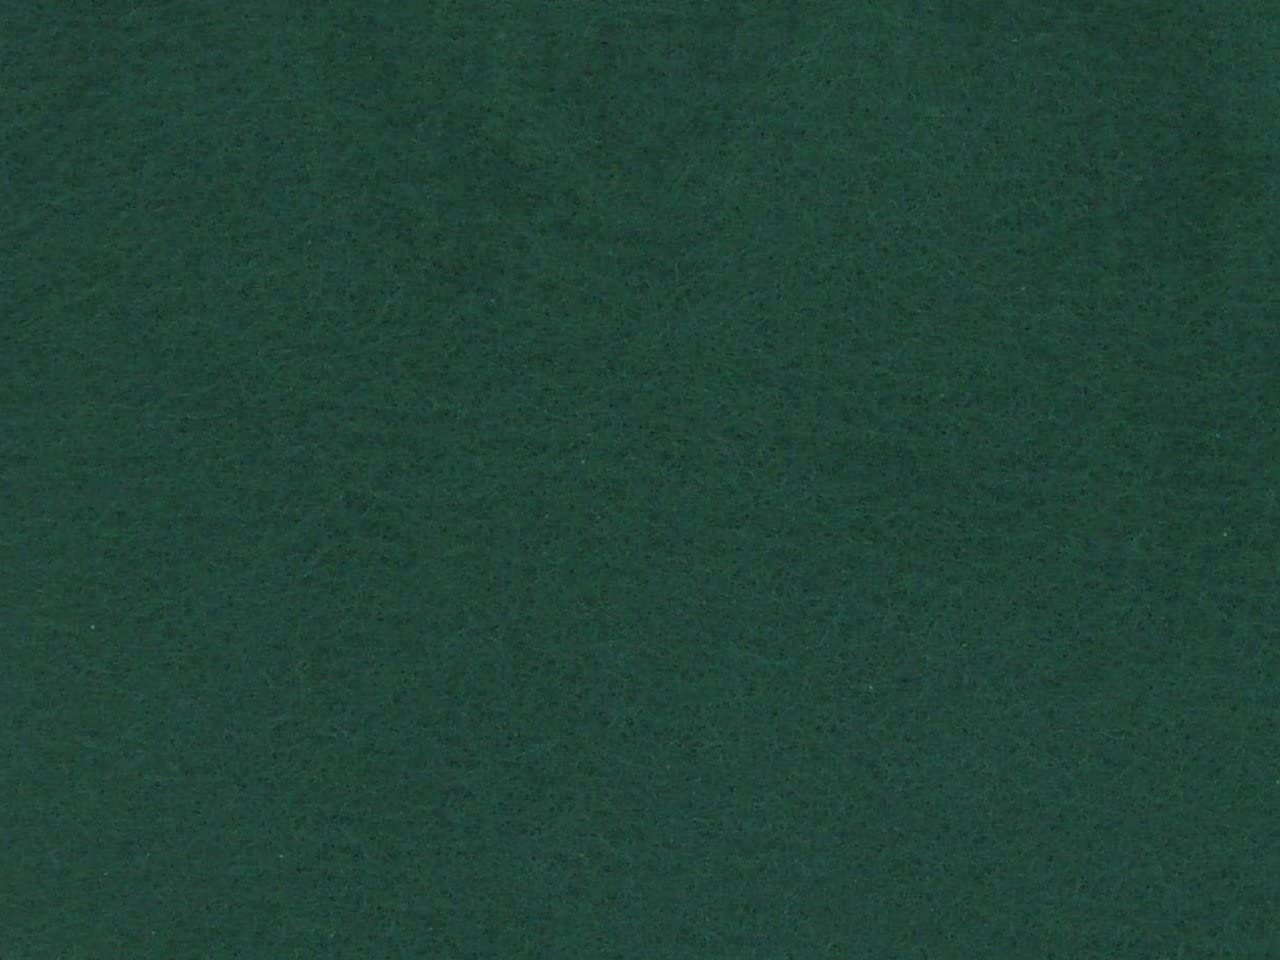 147cm Wide Dalston Mill Fabrics Felt Fabric by The Metre Craft 1m Length Cornflower